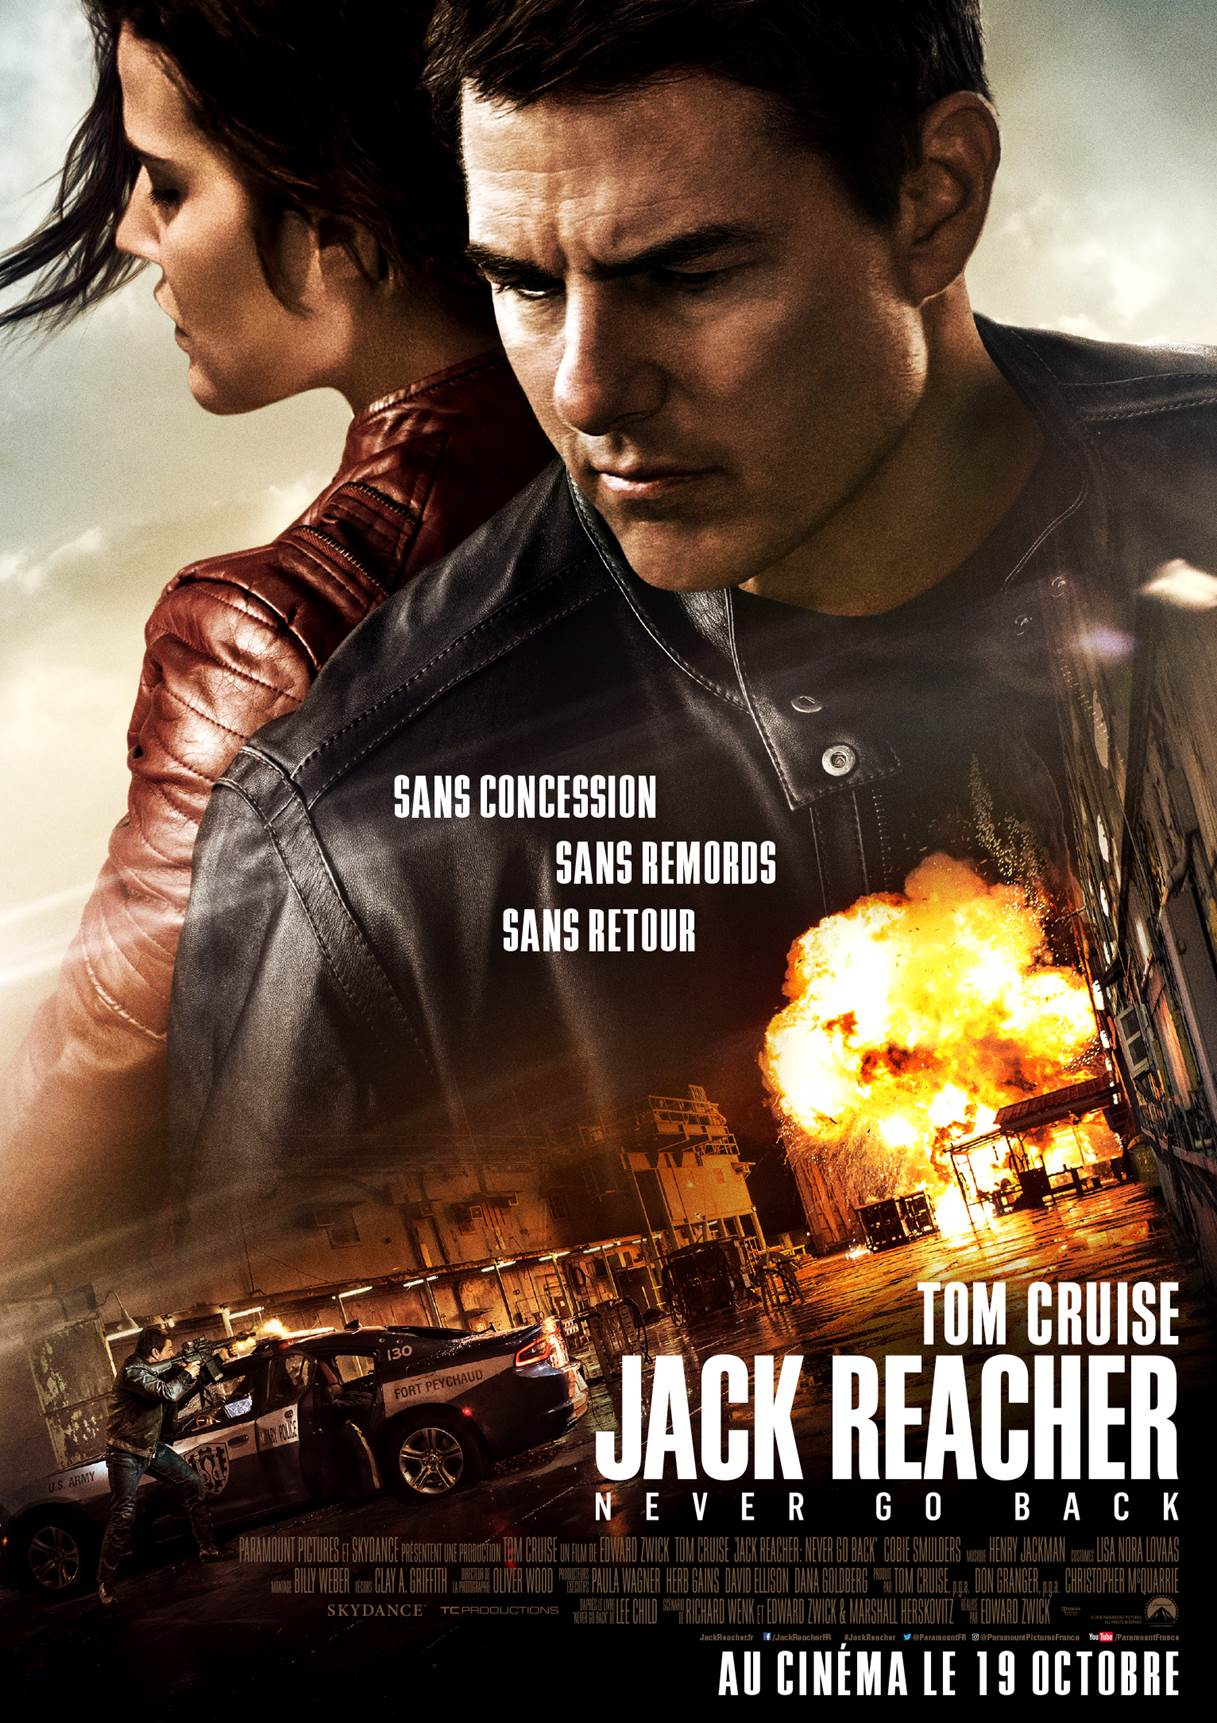 tom cruise dans Jack Reacher : Never Go Back (2016) d'Edward Zwick